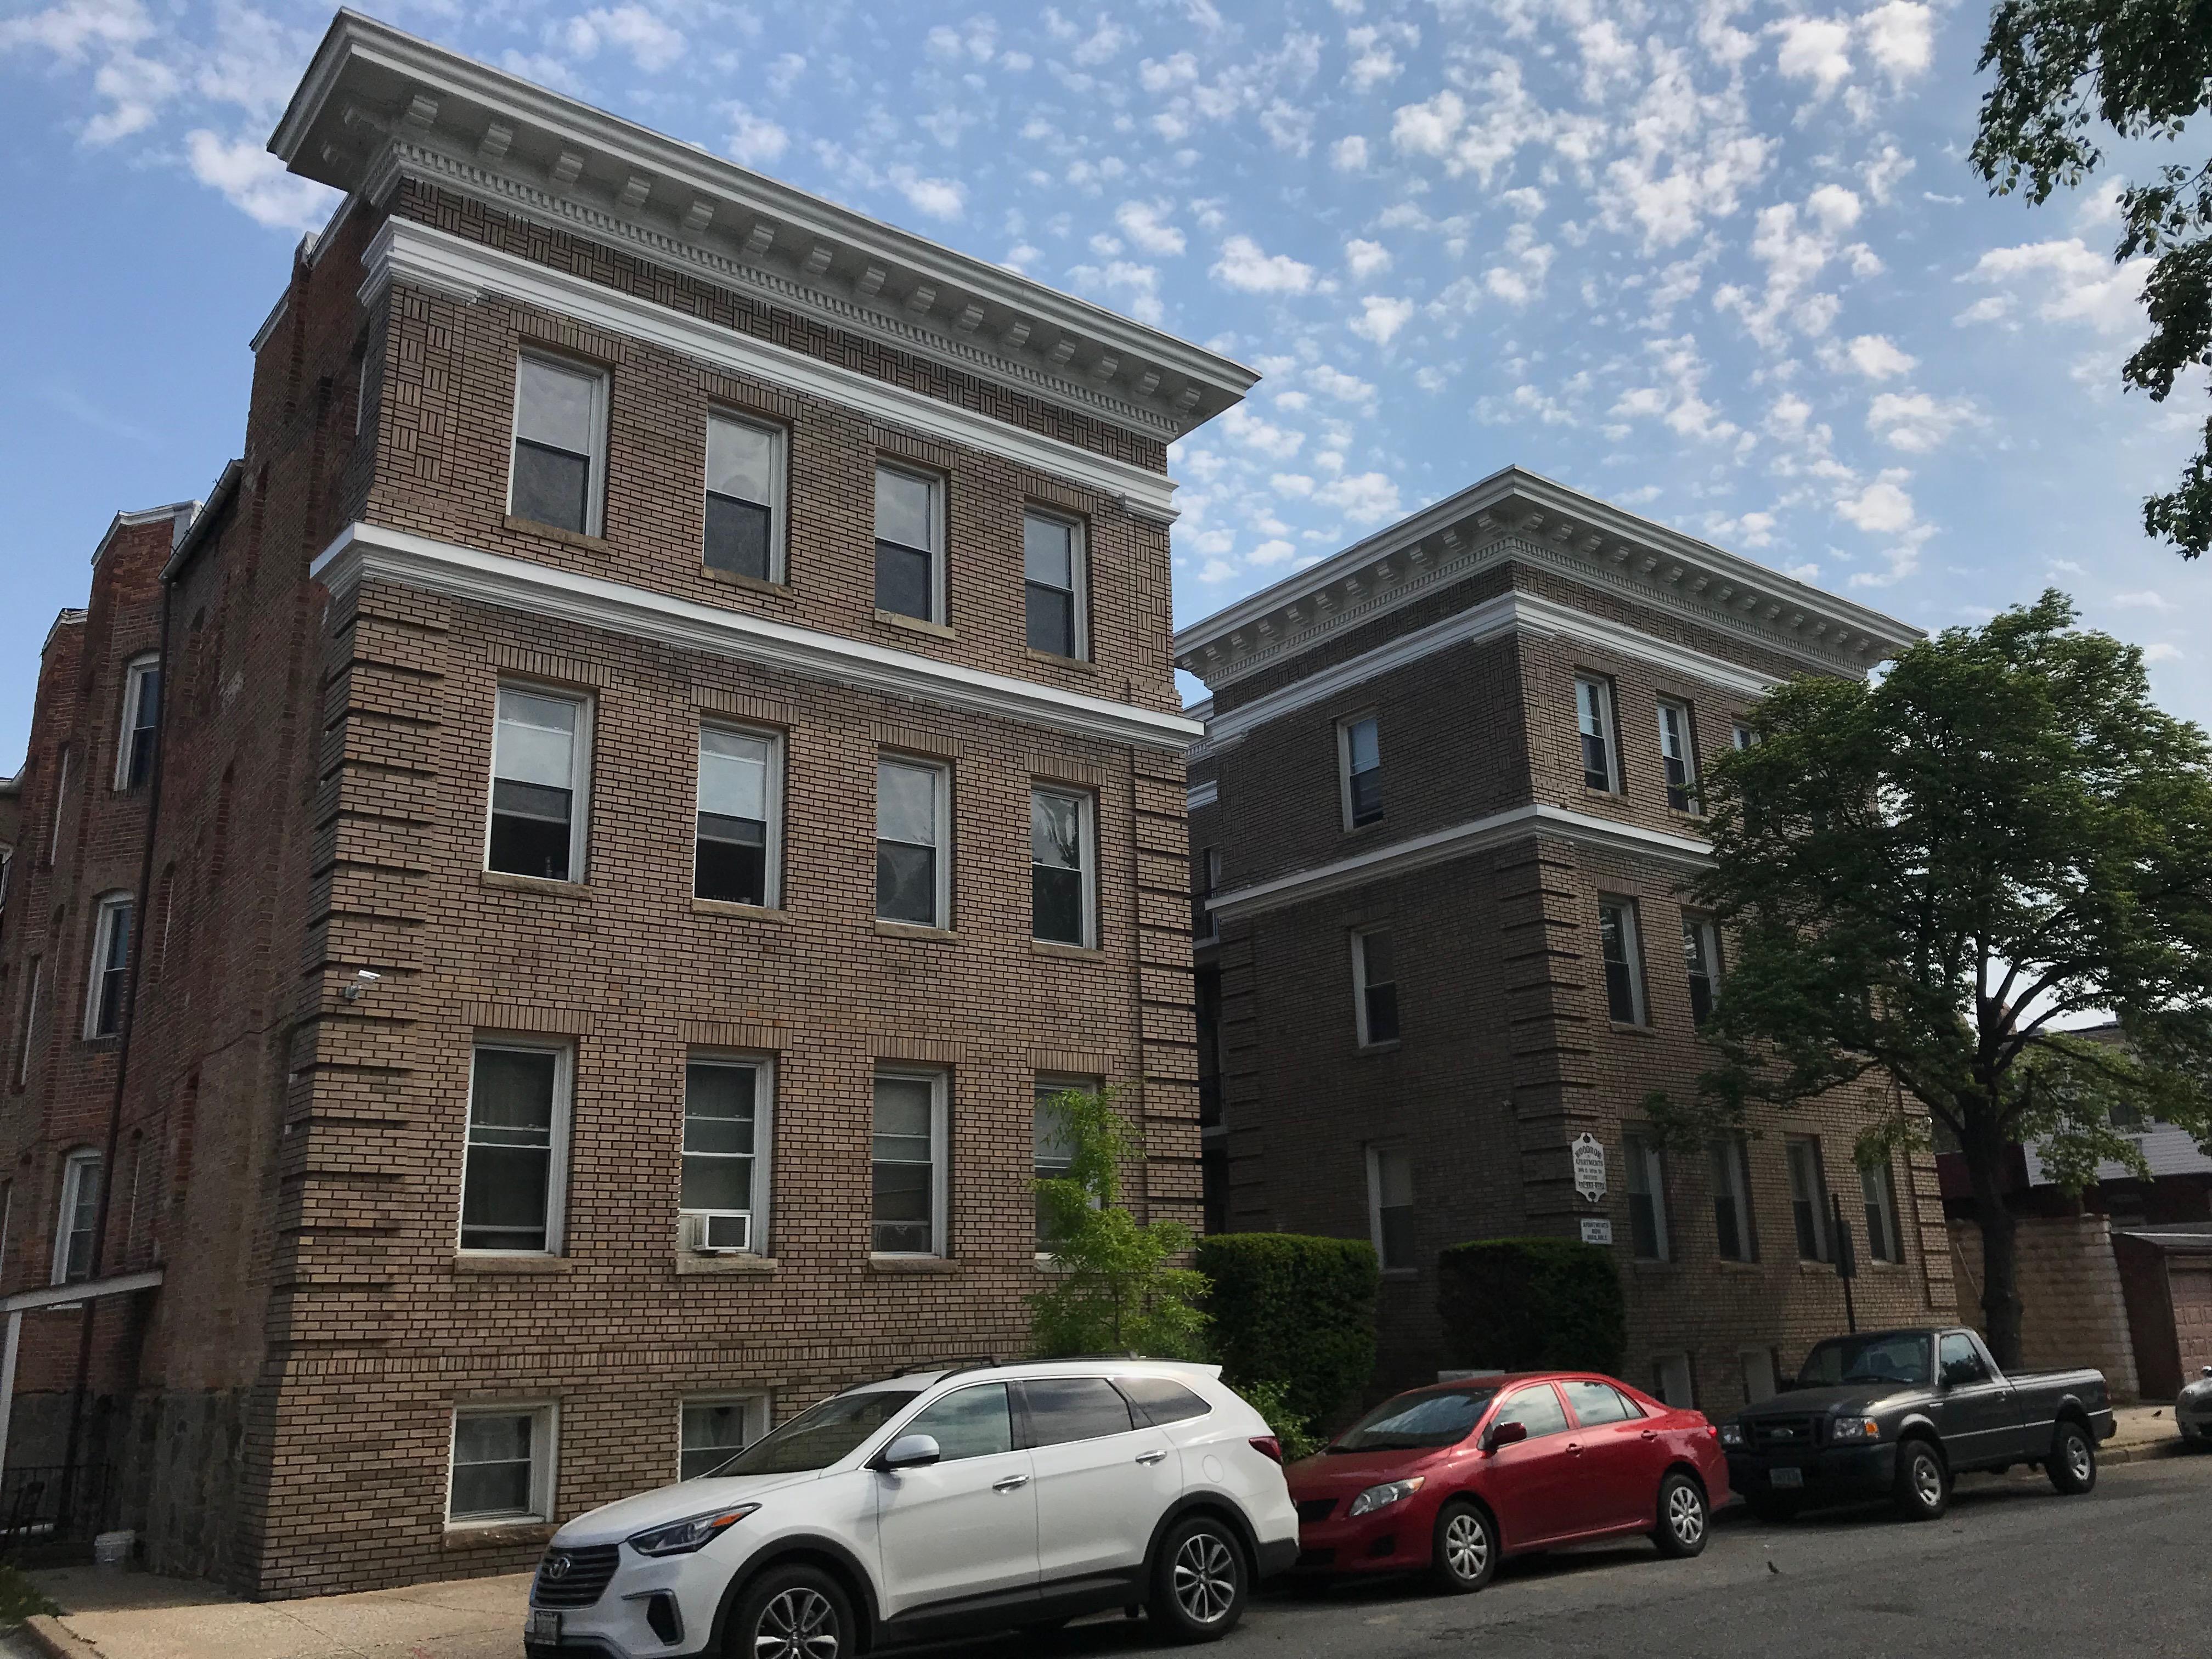 Woodrow apartments, 300 e. 30th street, baltimore, md 21218 photo